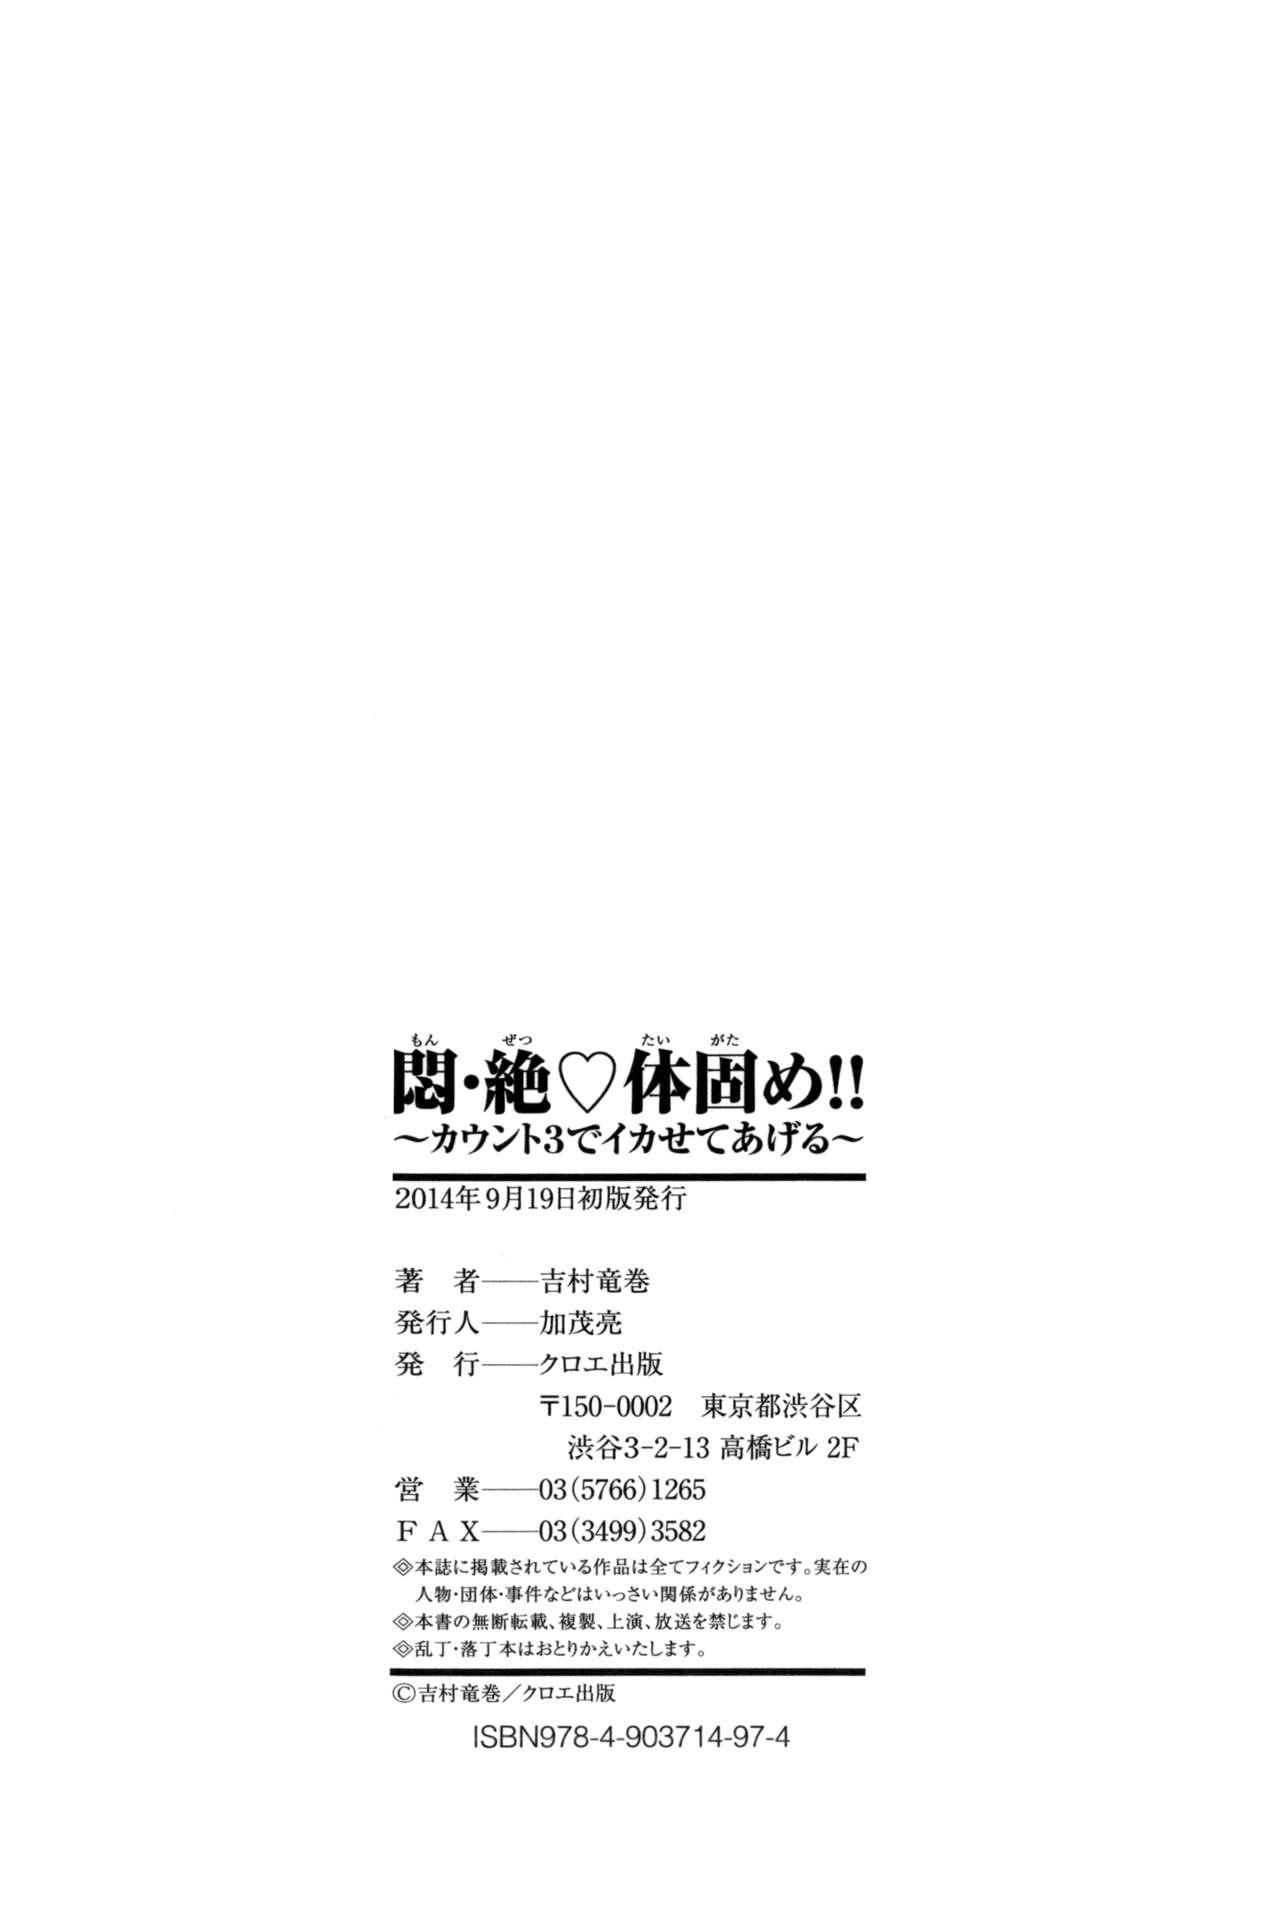 [Yoshimura Tatsumaki] Monzetsu Taigatame ~Count 3 de Ikasete Ageru~ | Faint in Agony Bodylock ~I'll make you cum on the count of 3~ [English] [Brolen] 235